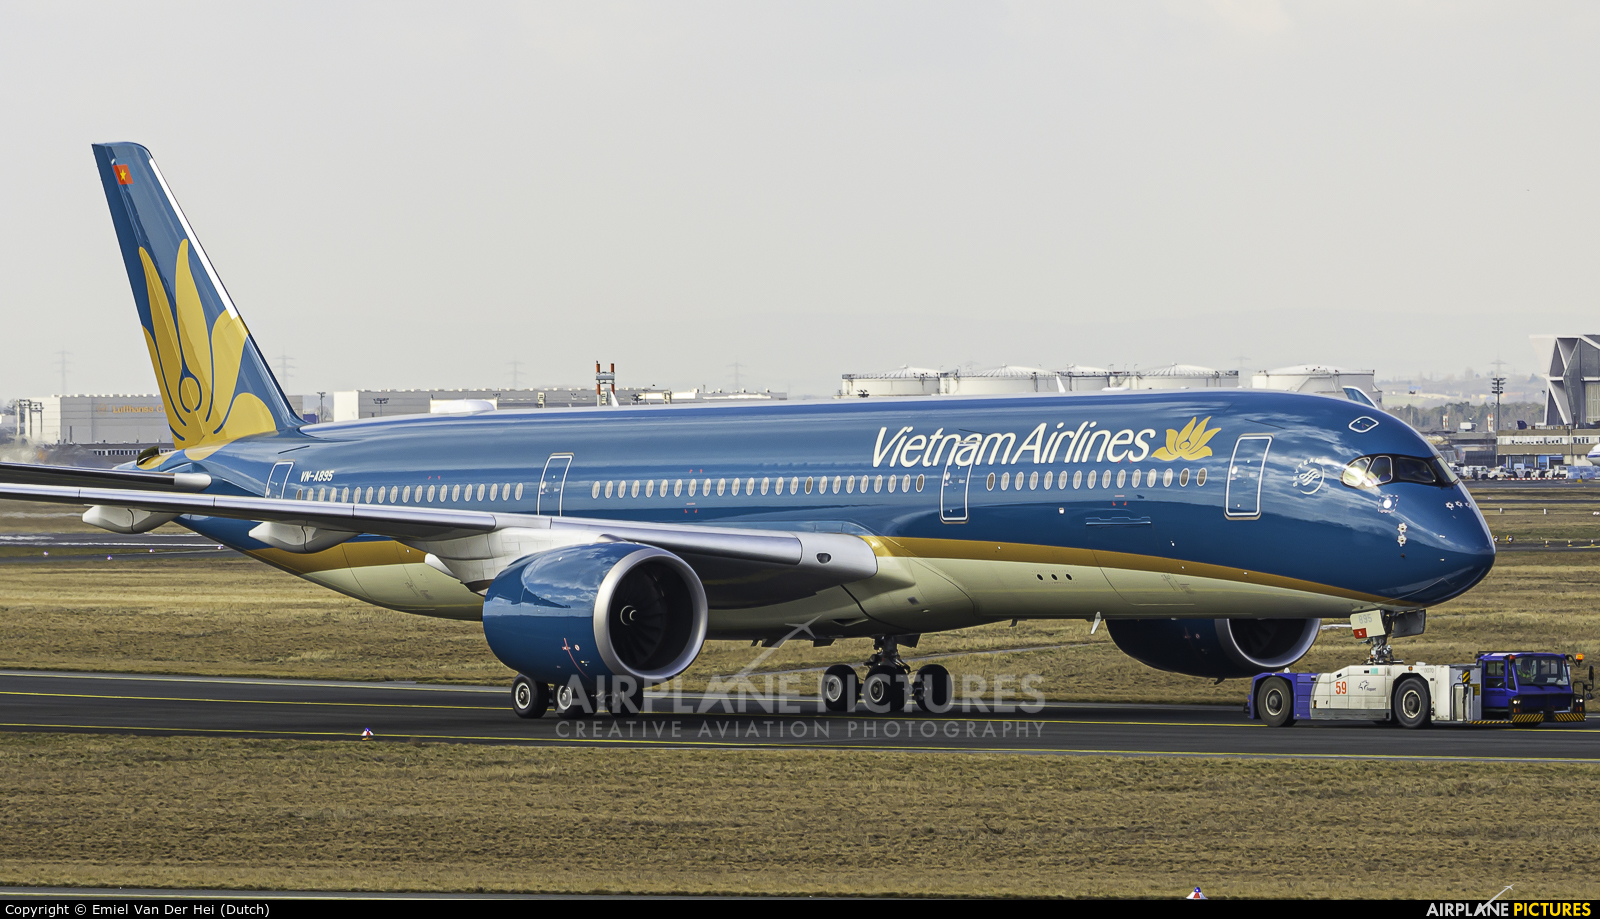 Vietnam Airlines VN-A895 aircraft at Frankfurt